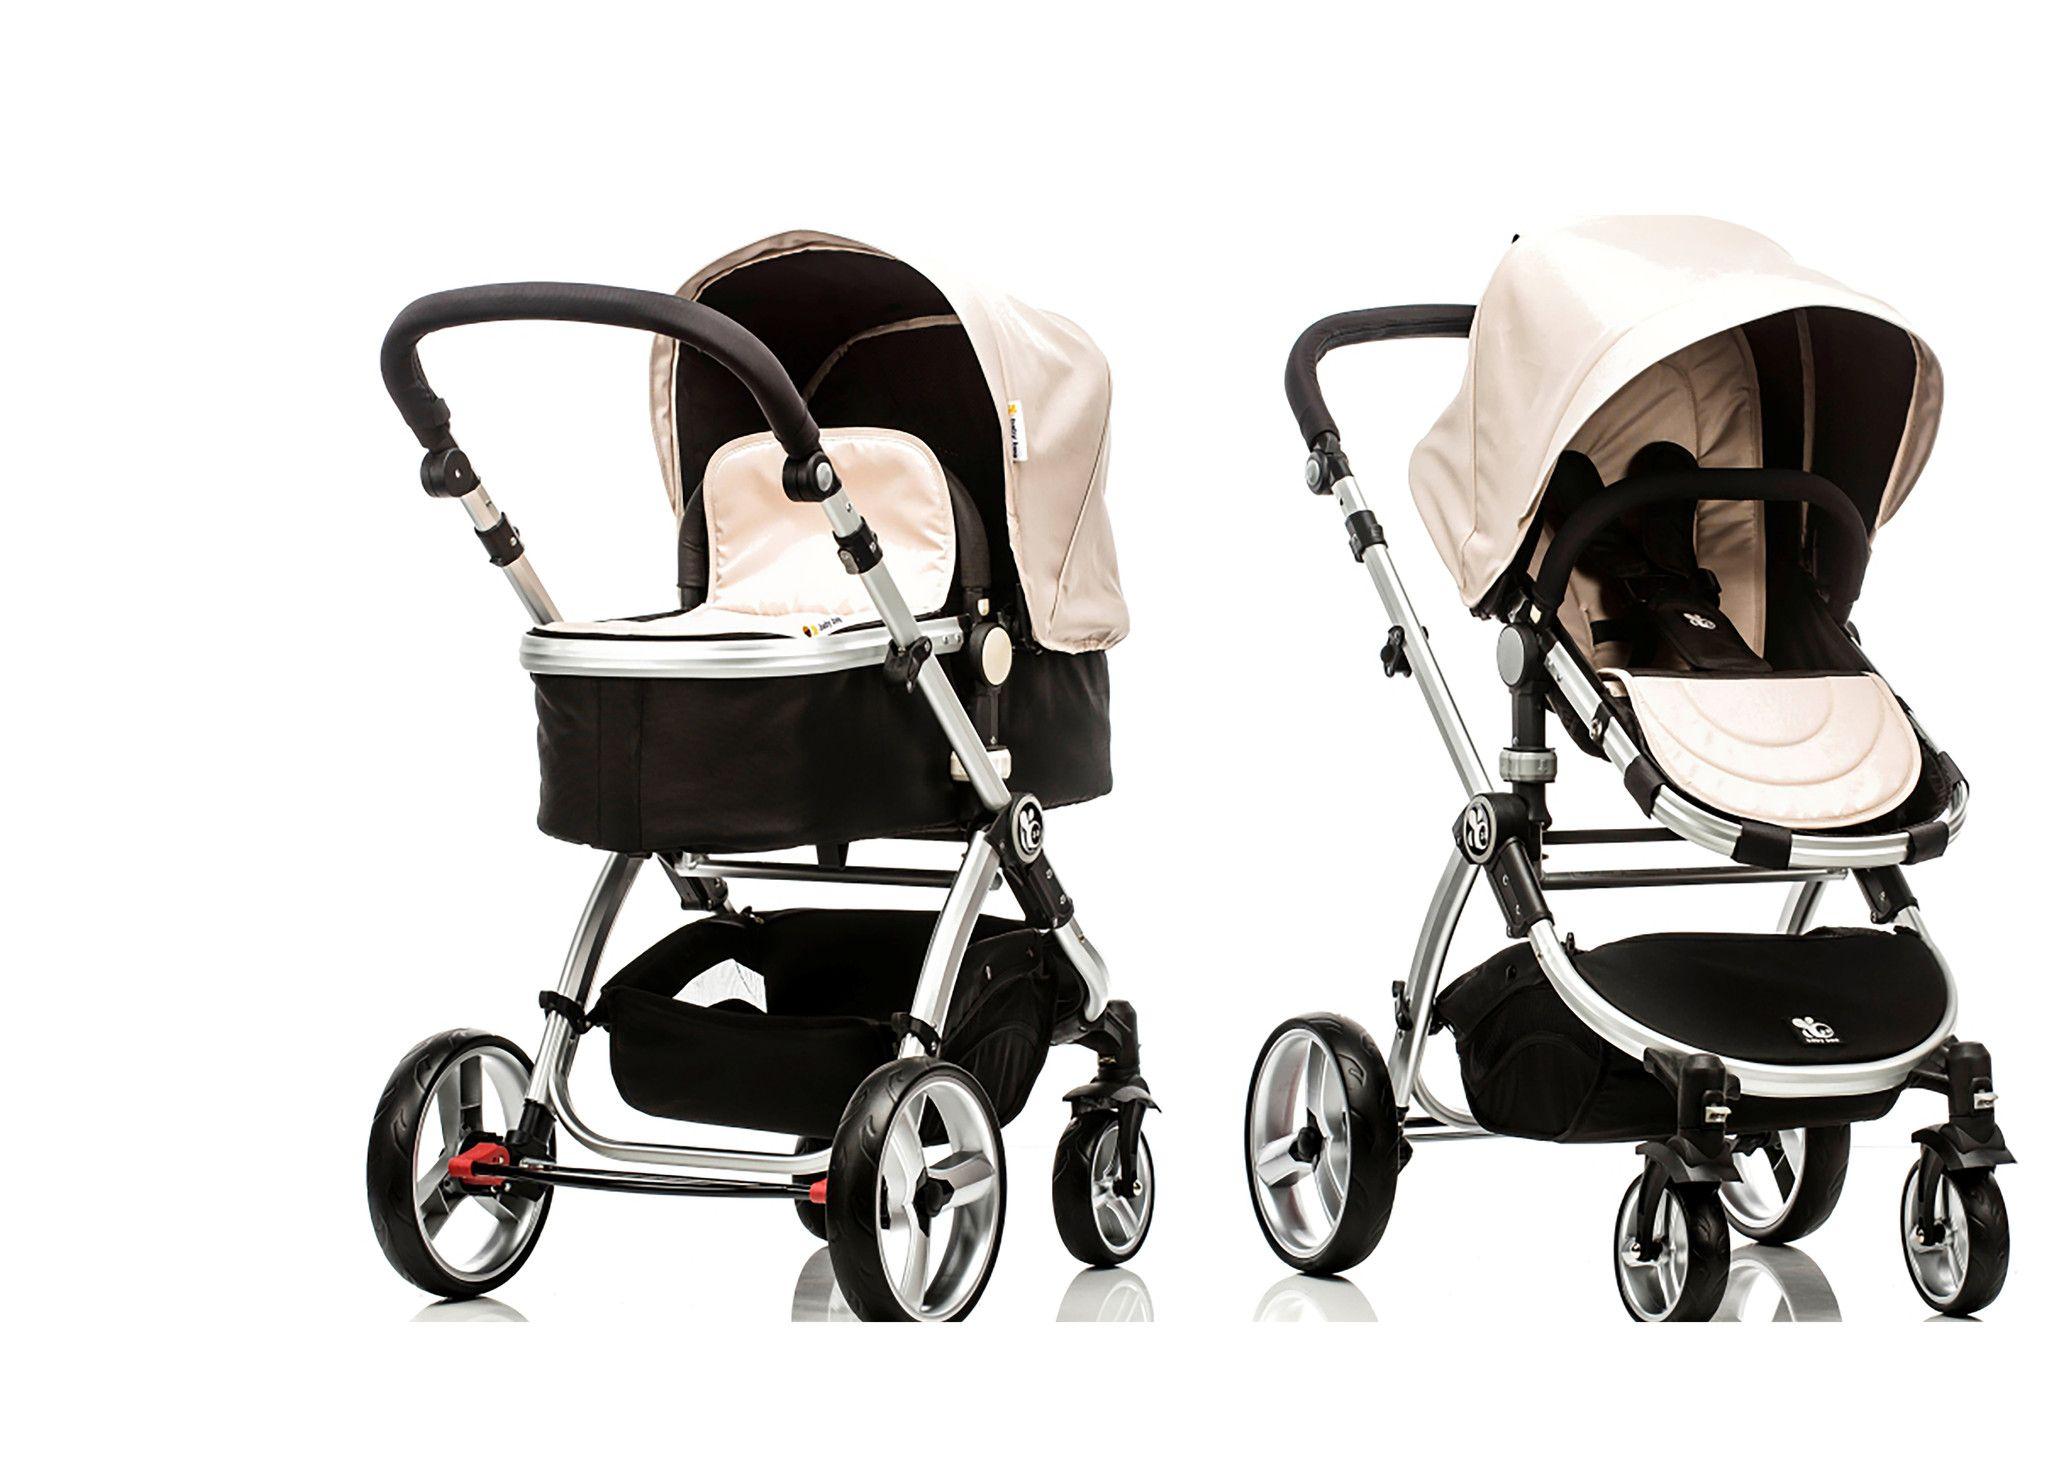 Baby Prams & Strollers | 2 in 1 Bassinet & Stroller Se